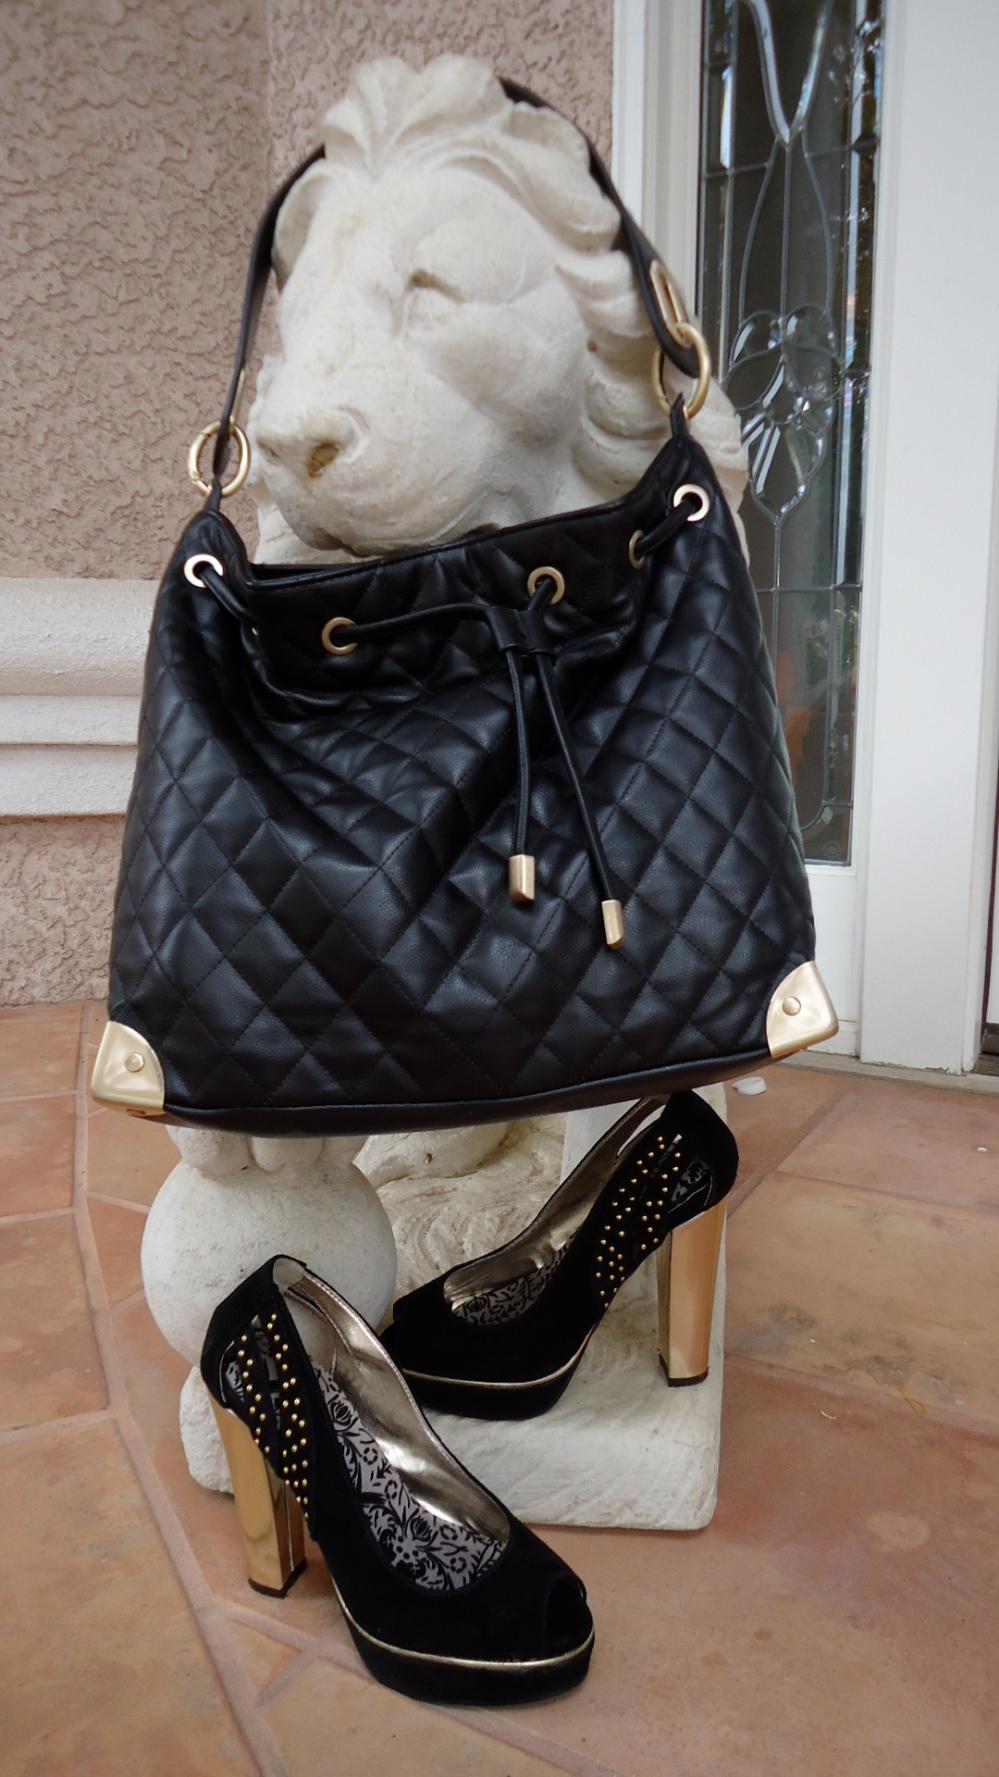 mark. Oh Couture Handbag and mark. So Pumped Heels